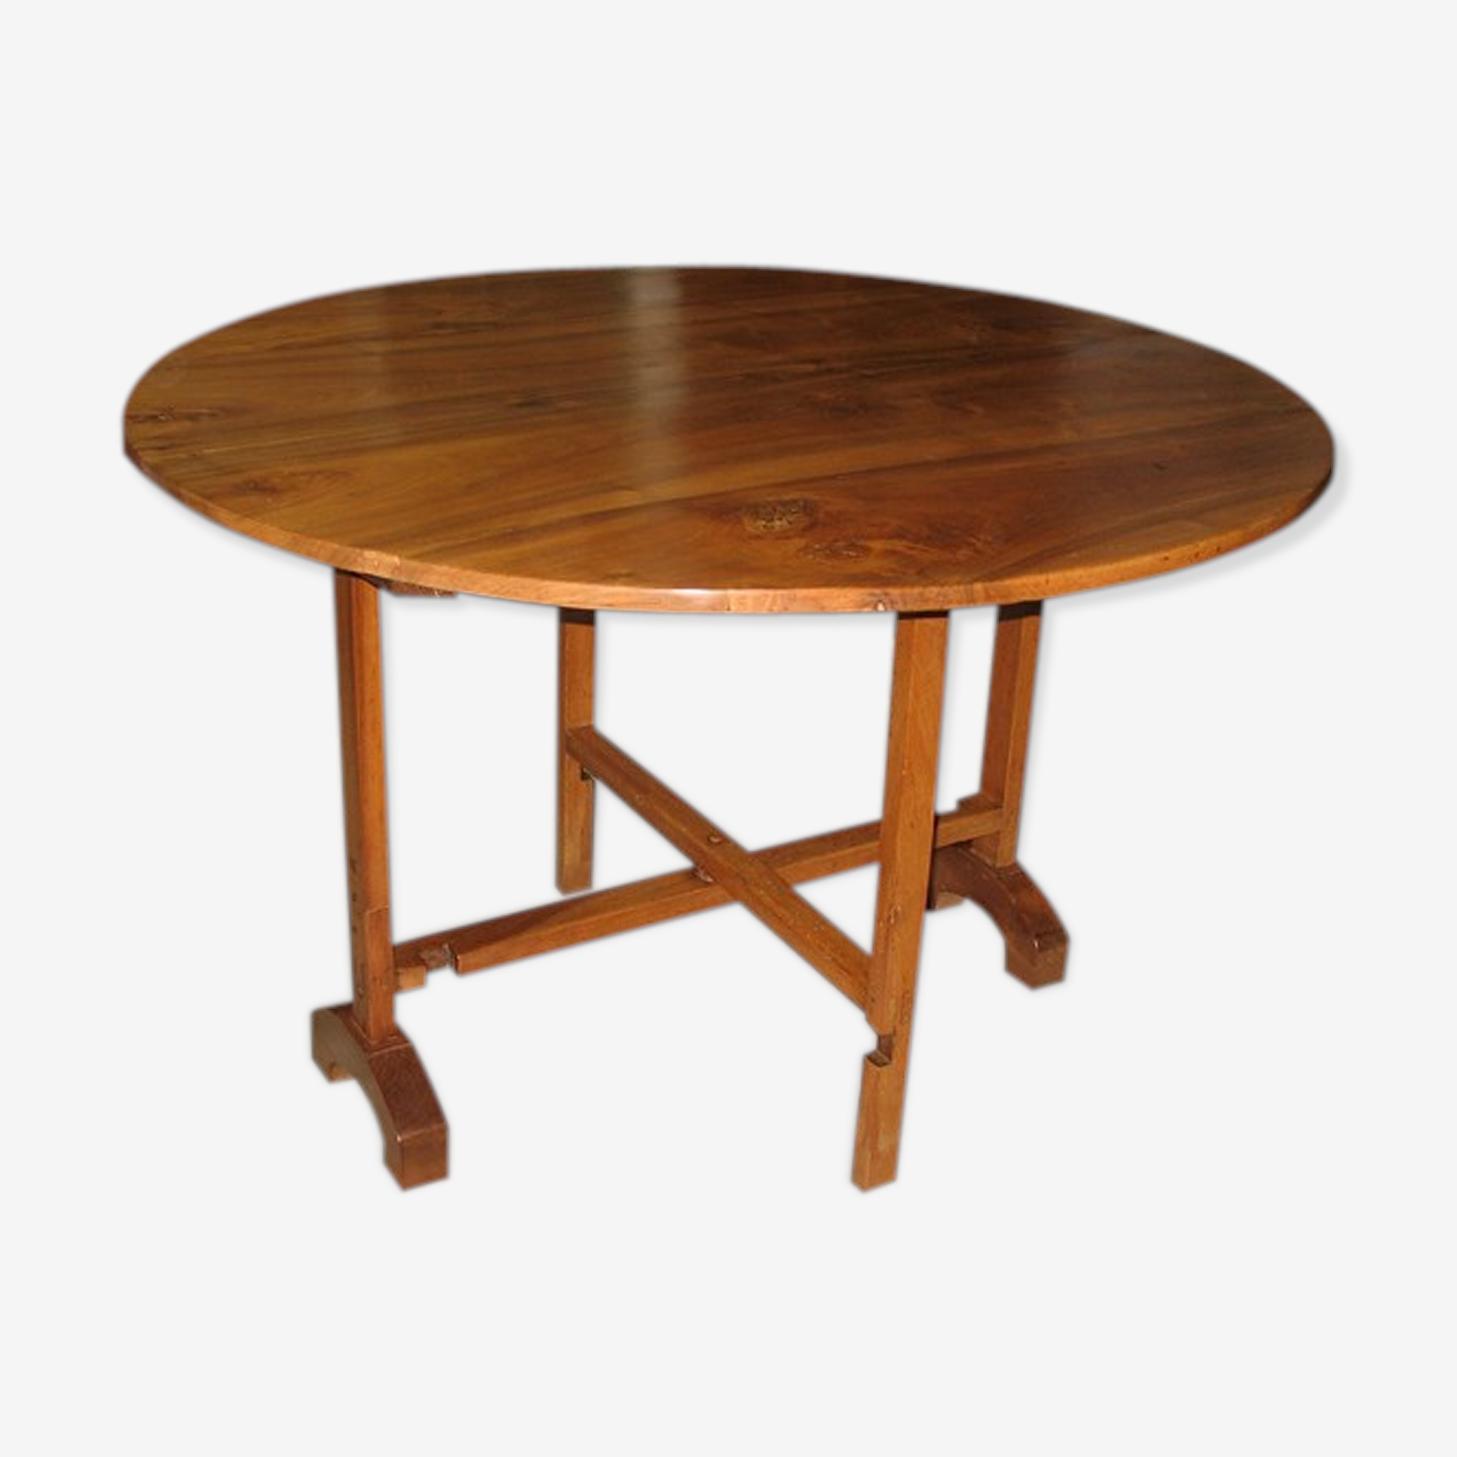 Table of winemaker in oyer XIX